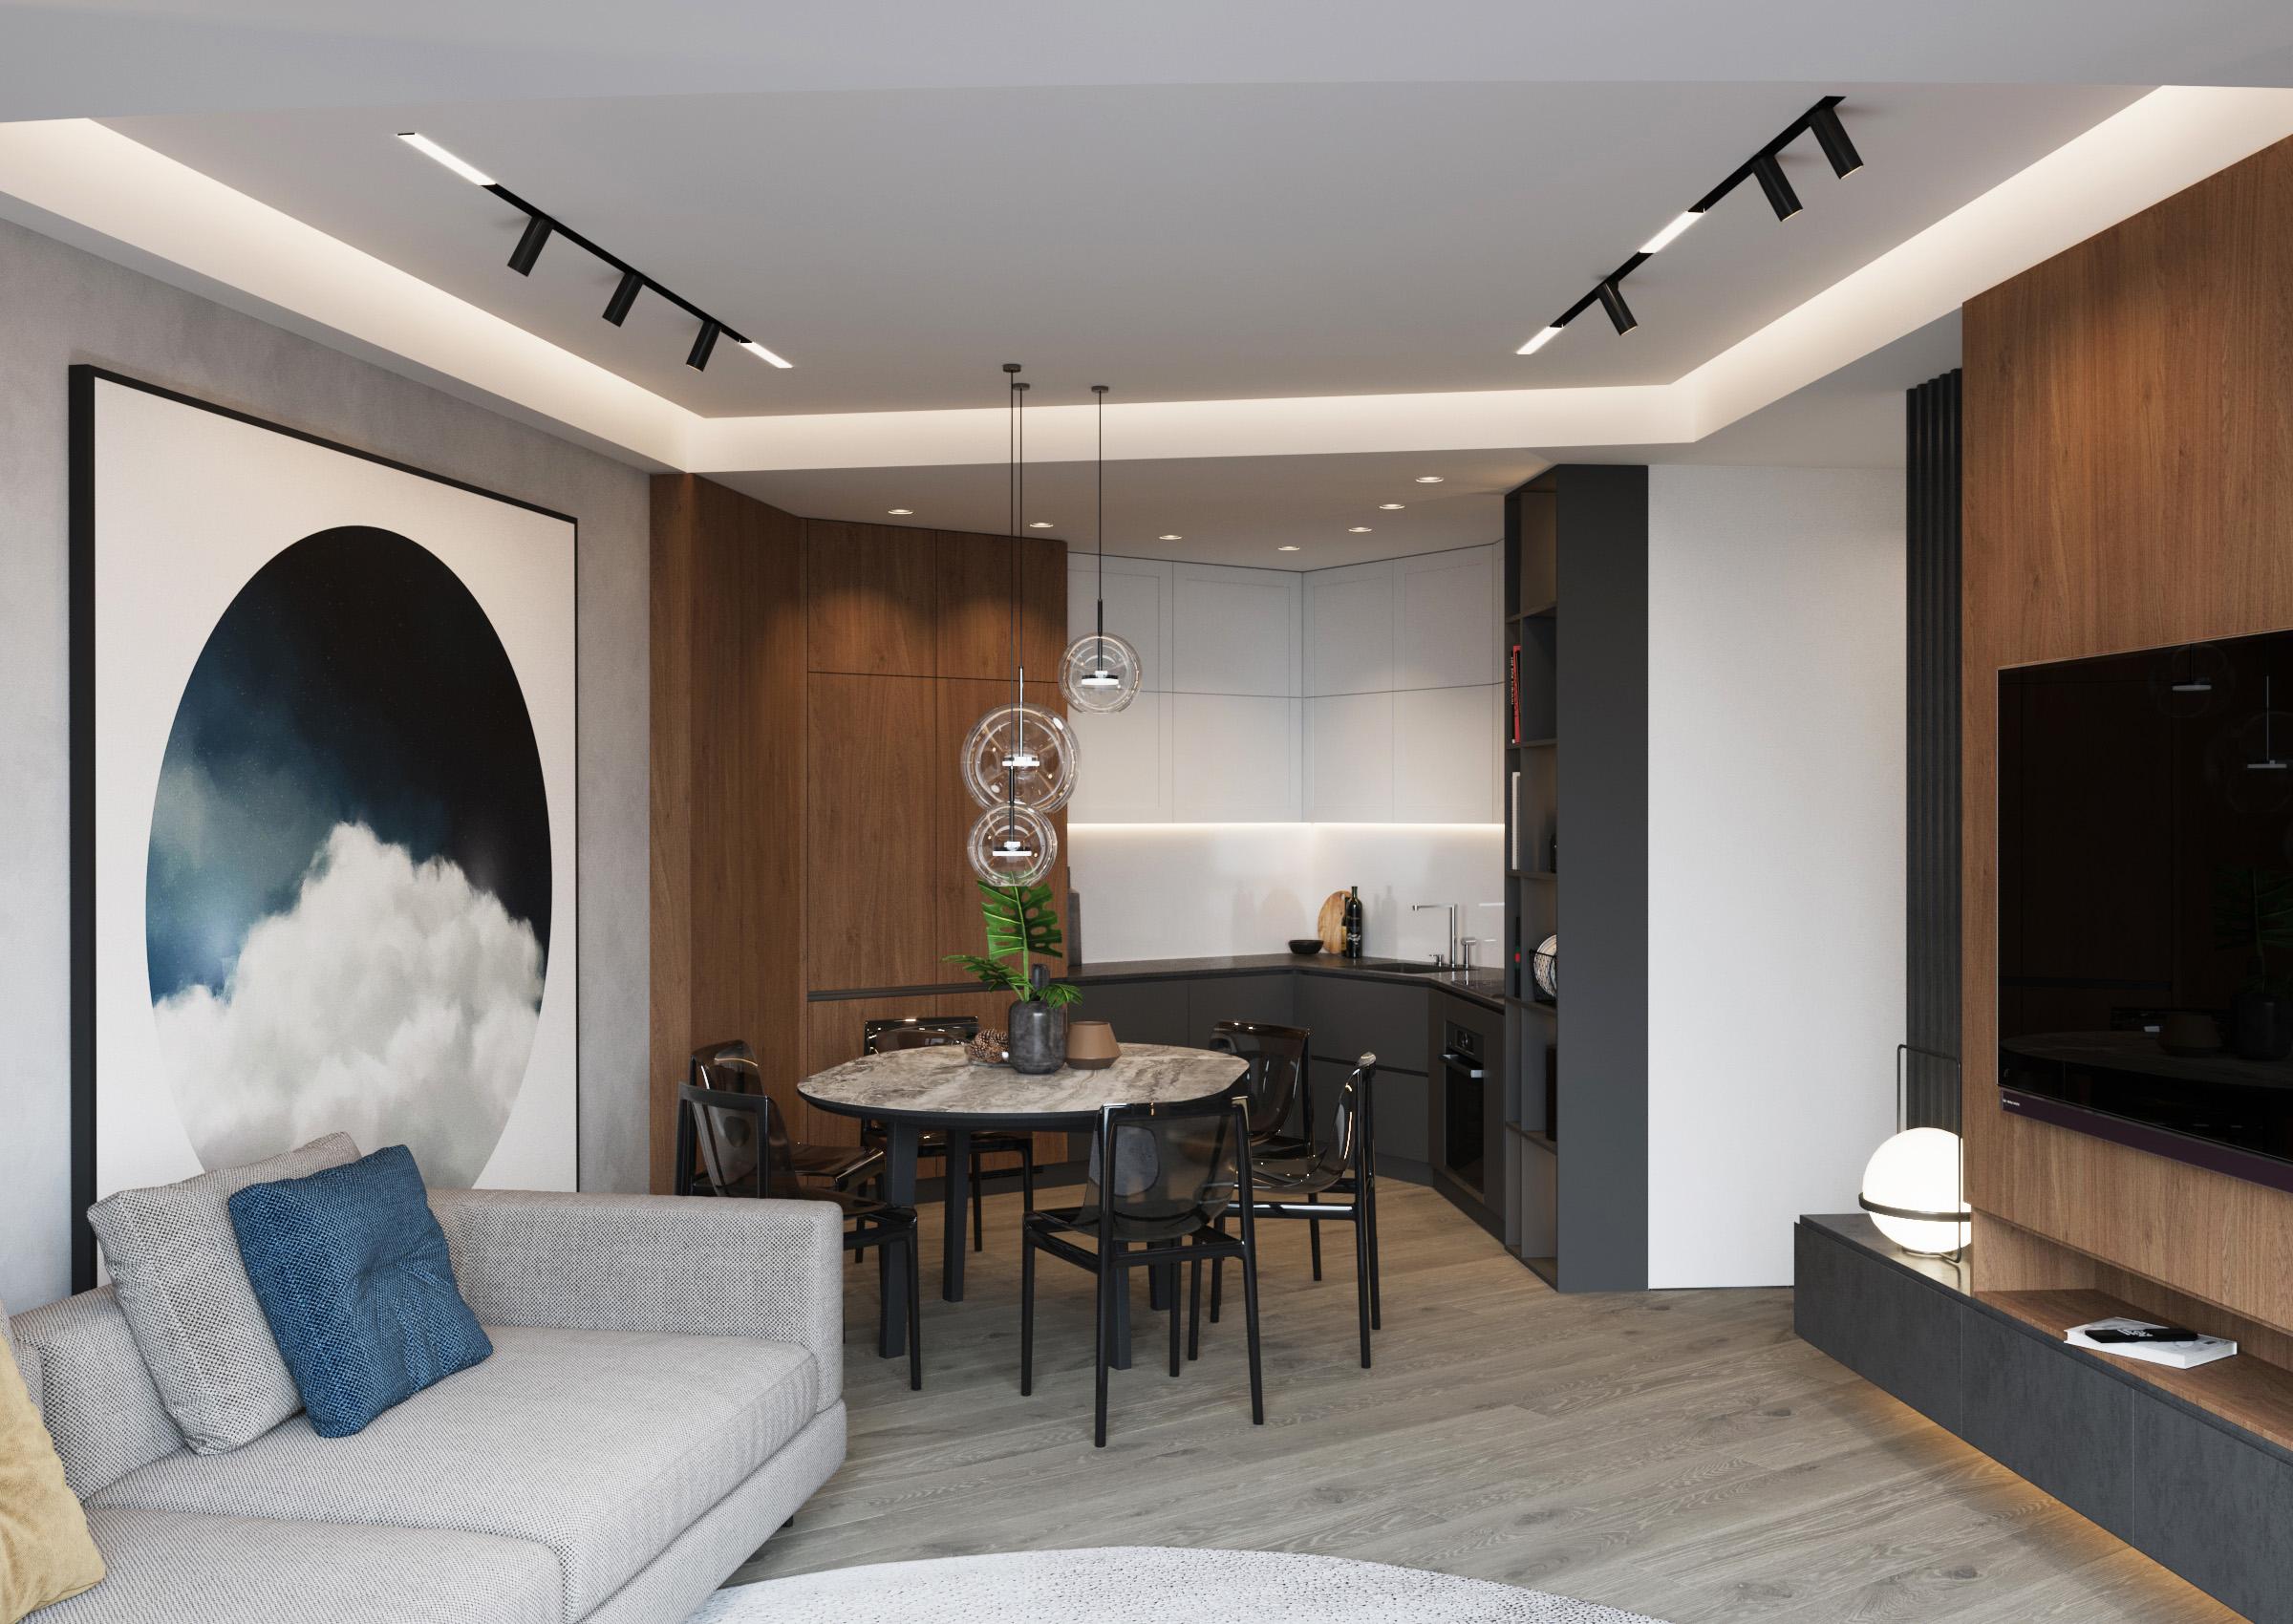 Living room panouri tencuite cu efect de beton și luminare Led